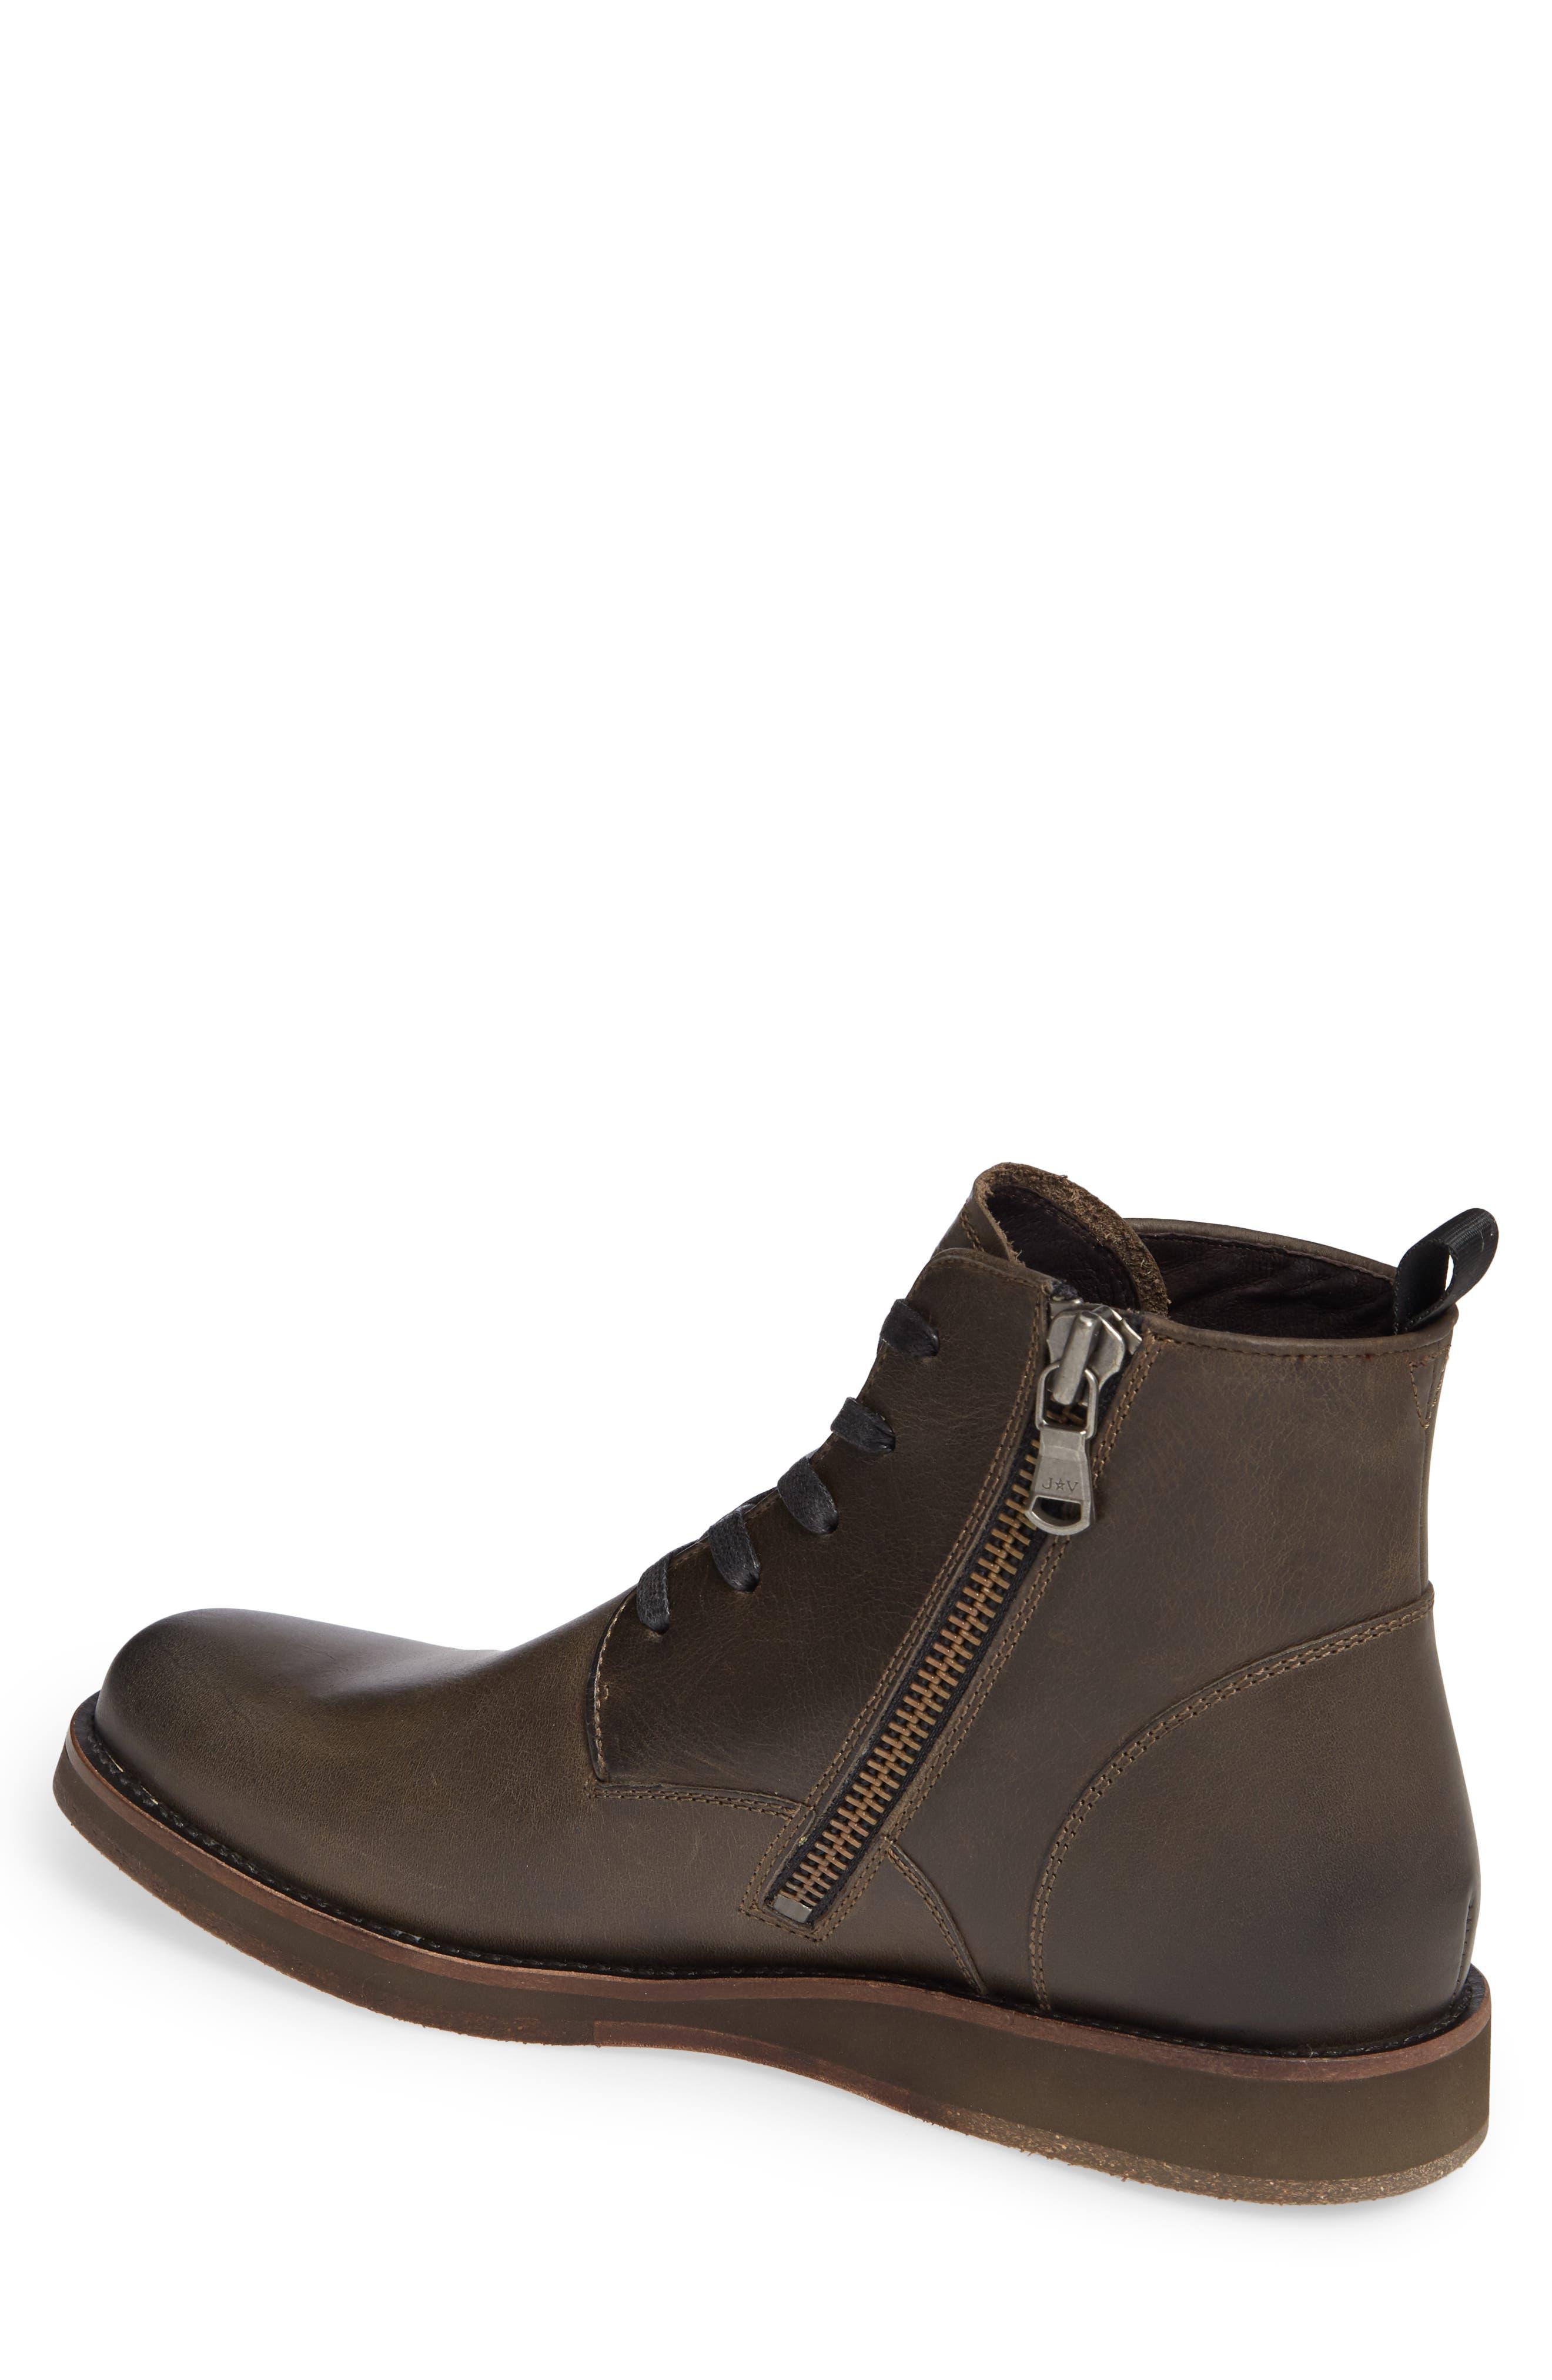 Brooklyn Plain Toe Boot,                             Alternate thumbnail 2, color,                             BLACK LEATHER